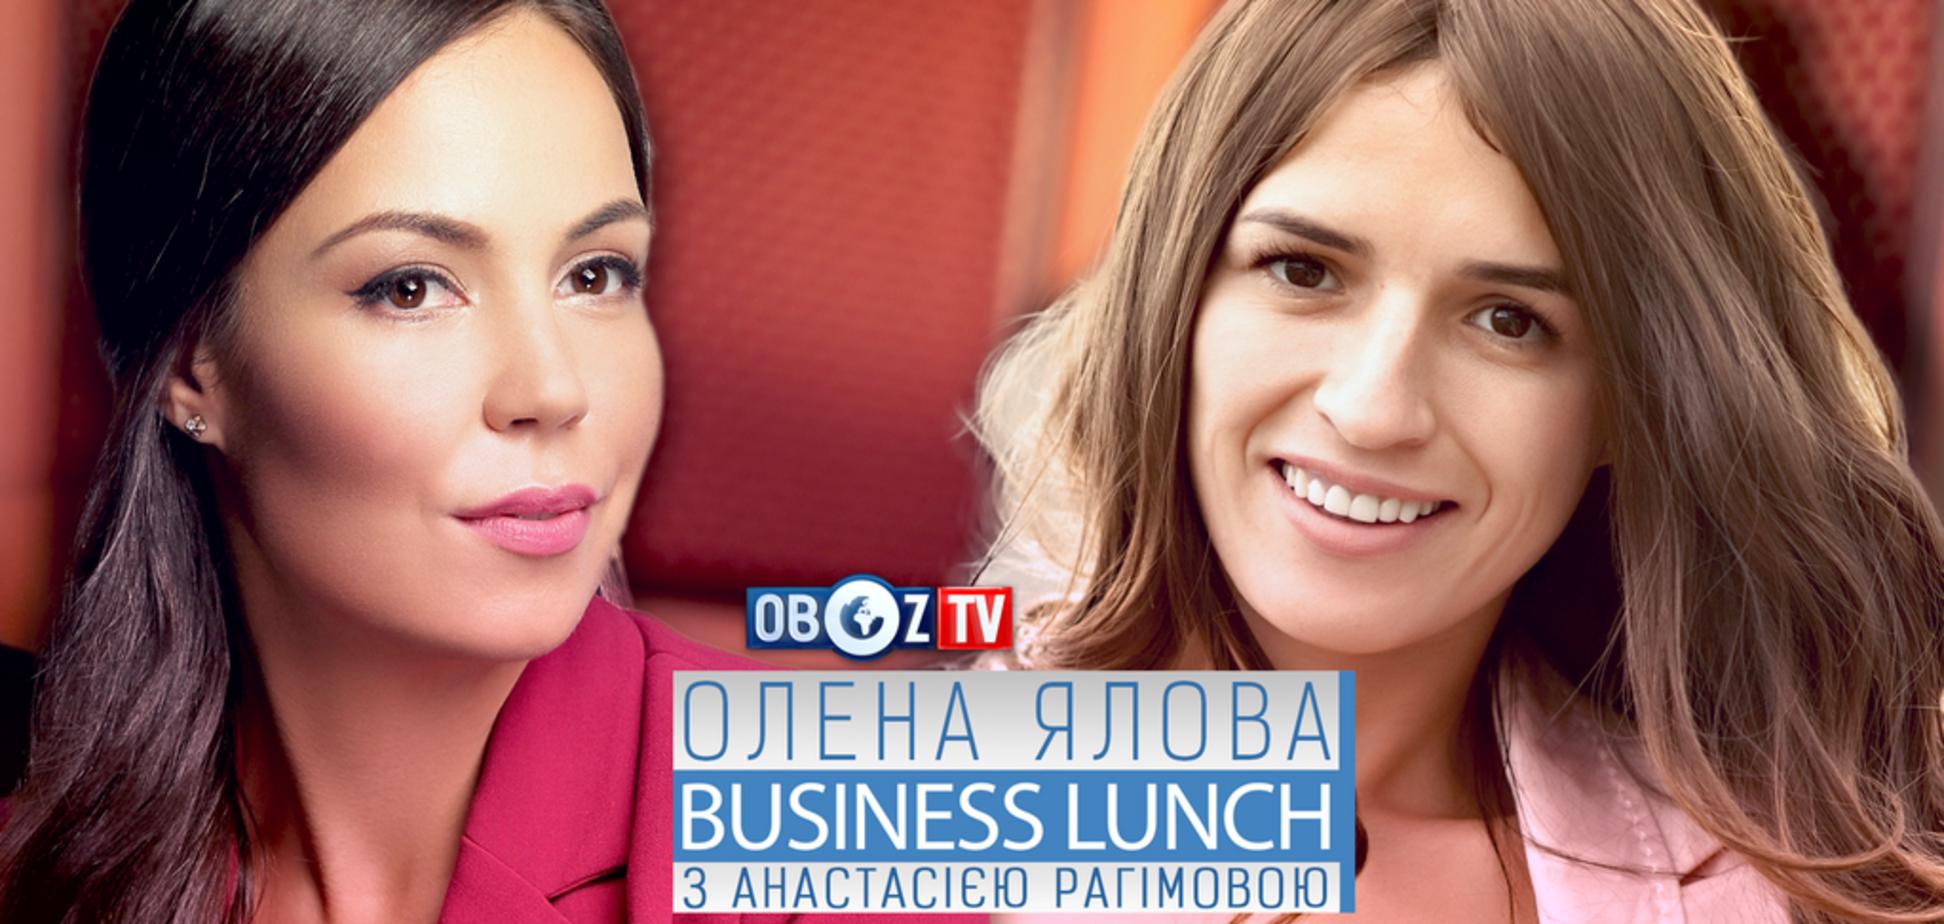 Олена Ялова | Business Lunch з Анастасією Рагімовою